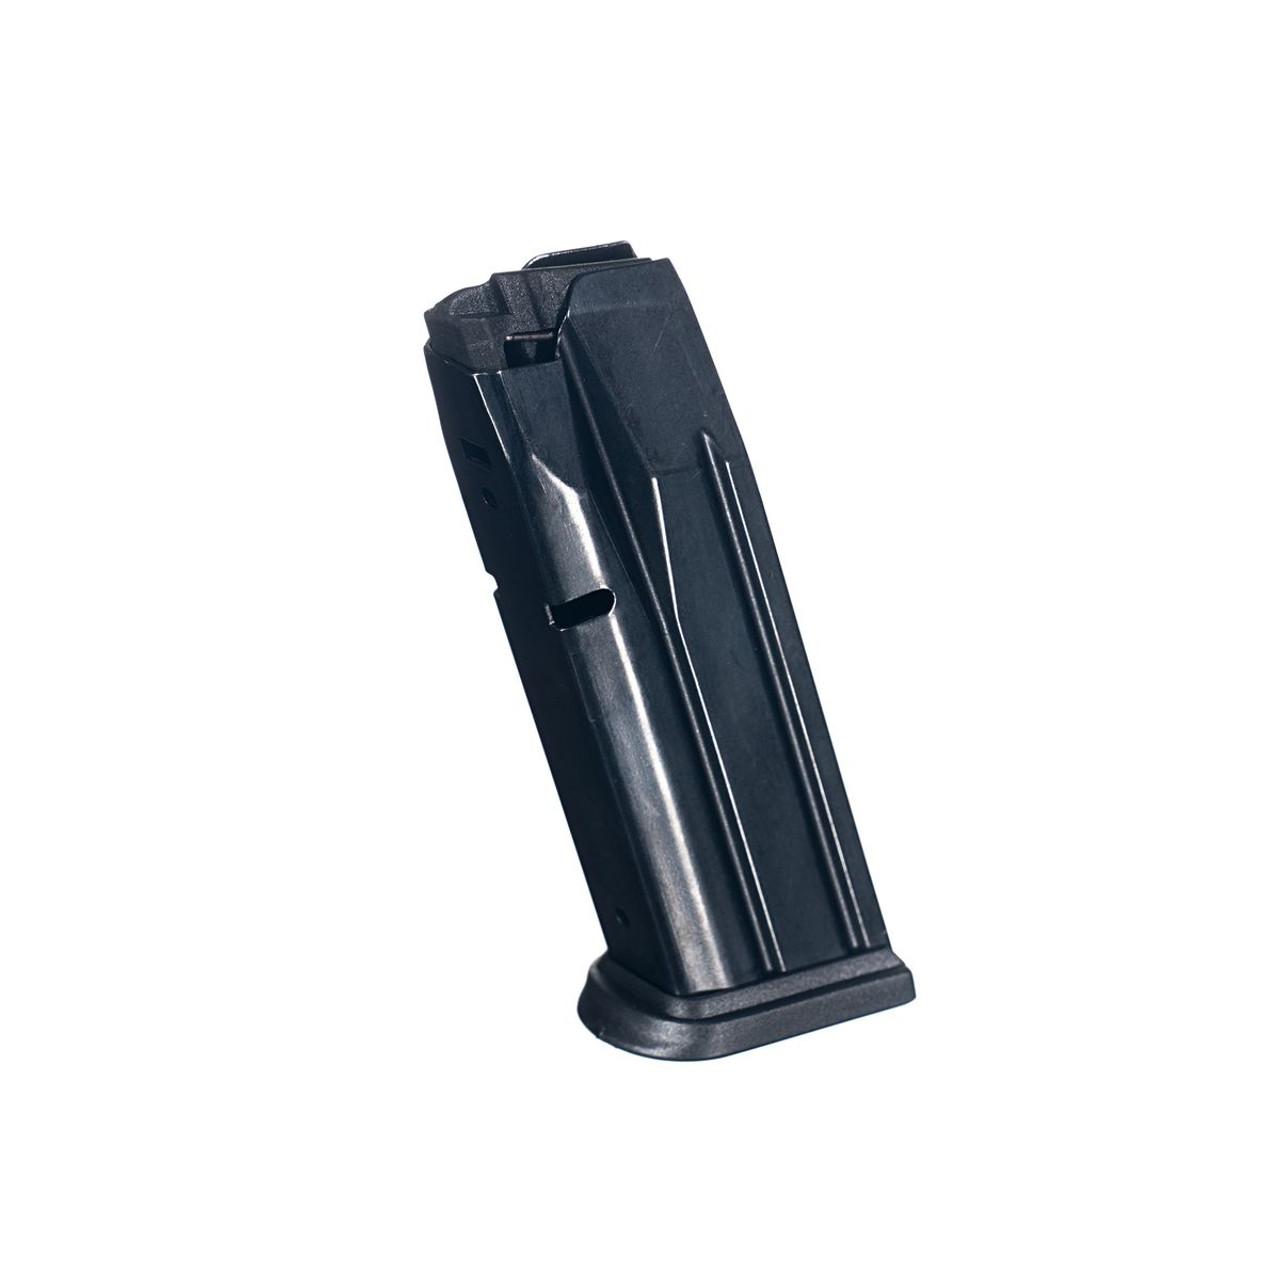 CZ® P10-C 9mm (10) Rd - Blue Steel